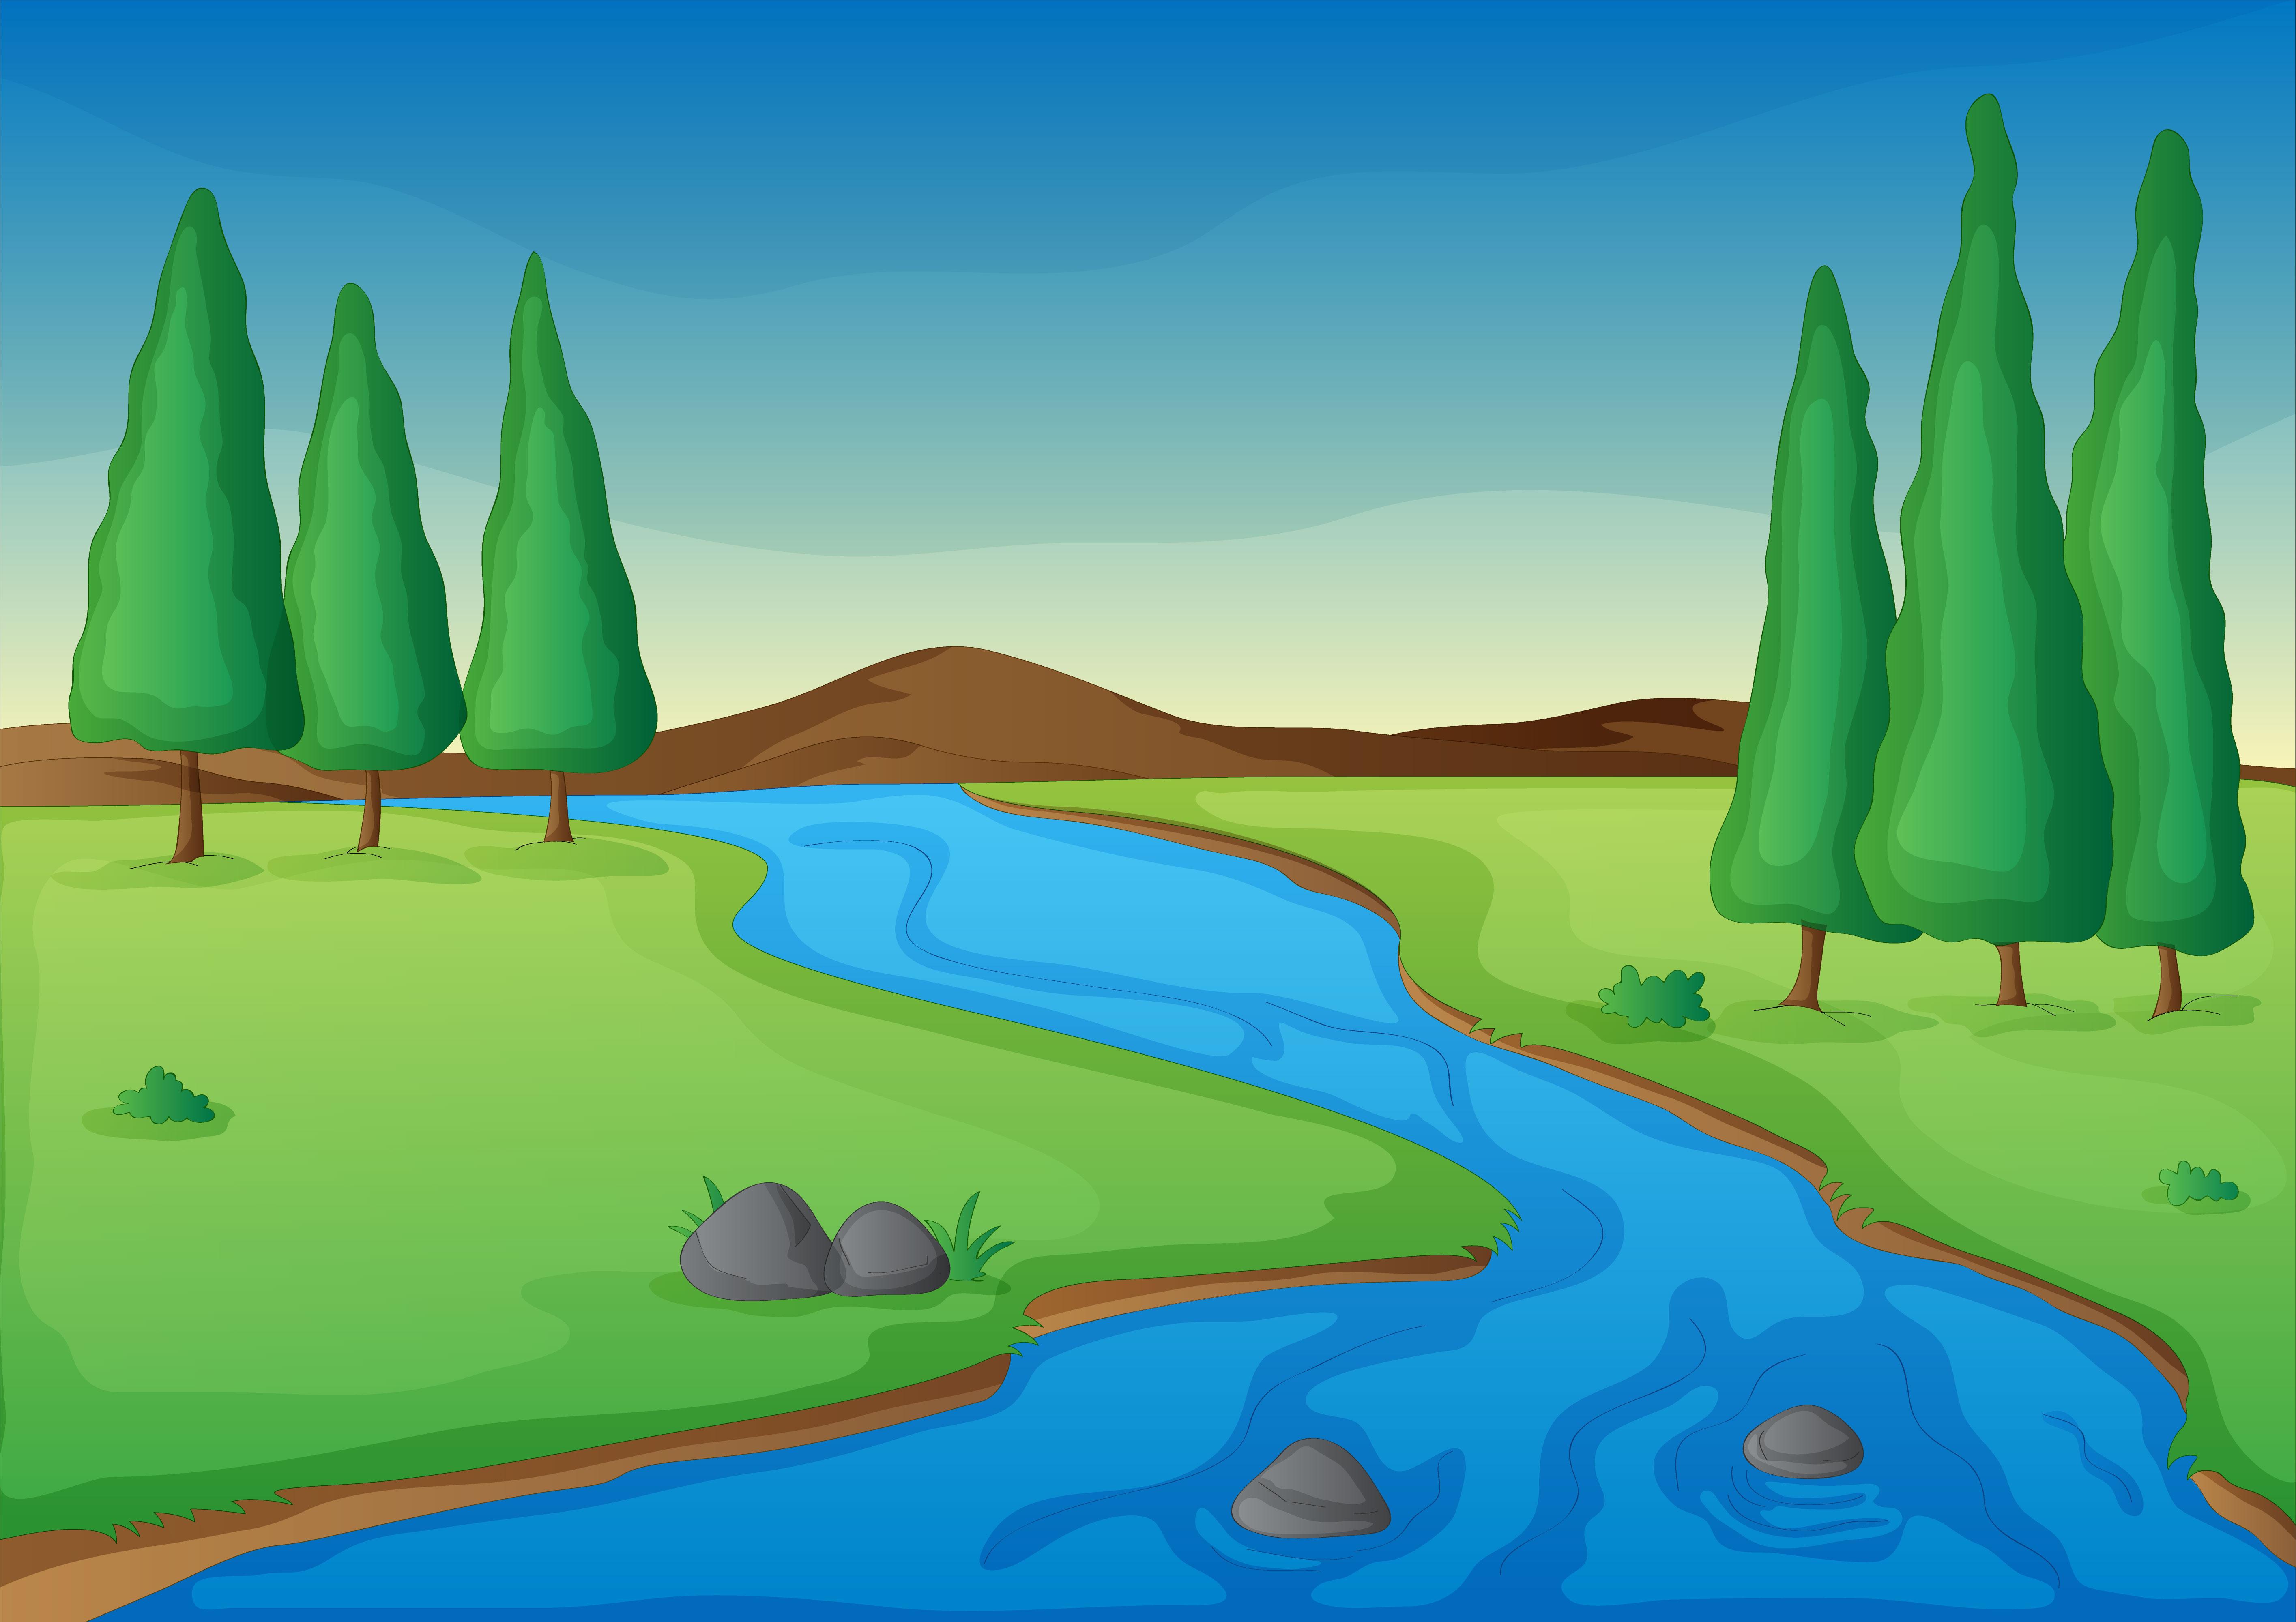 river download free vectors clipart graphics vector art vecteezy